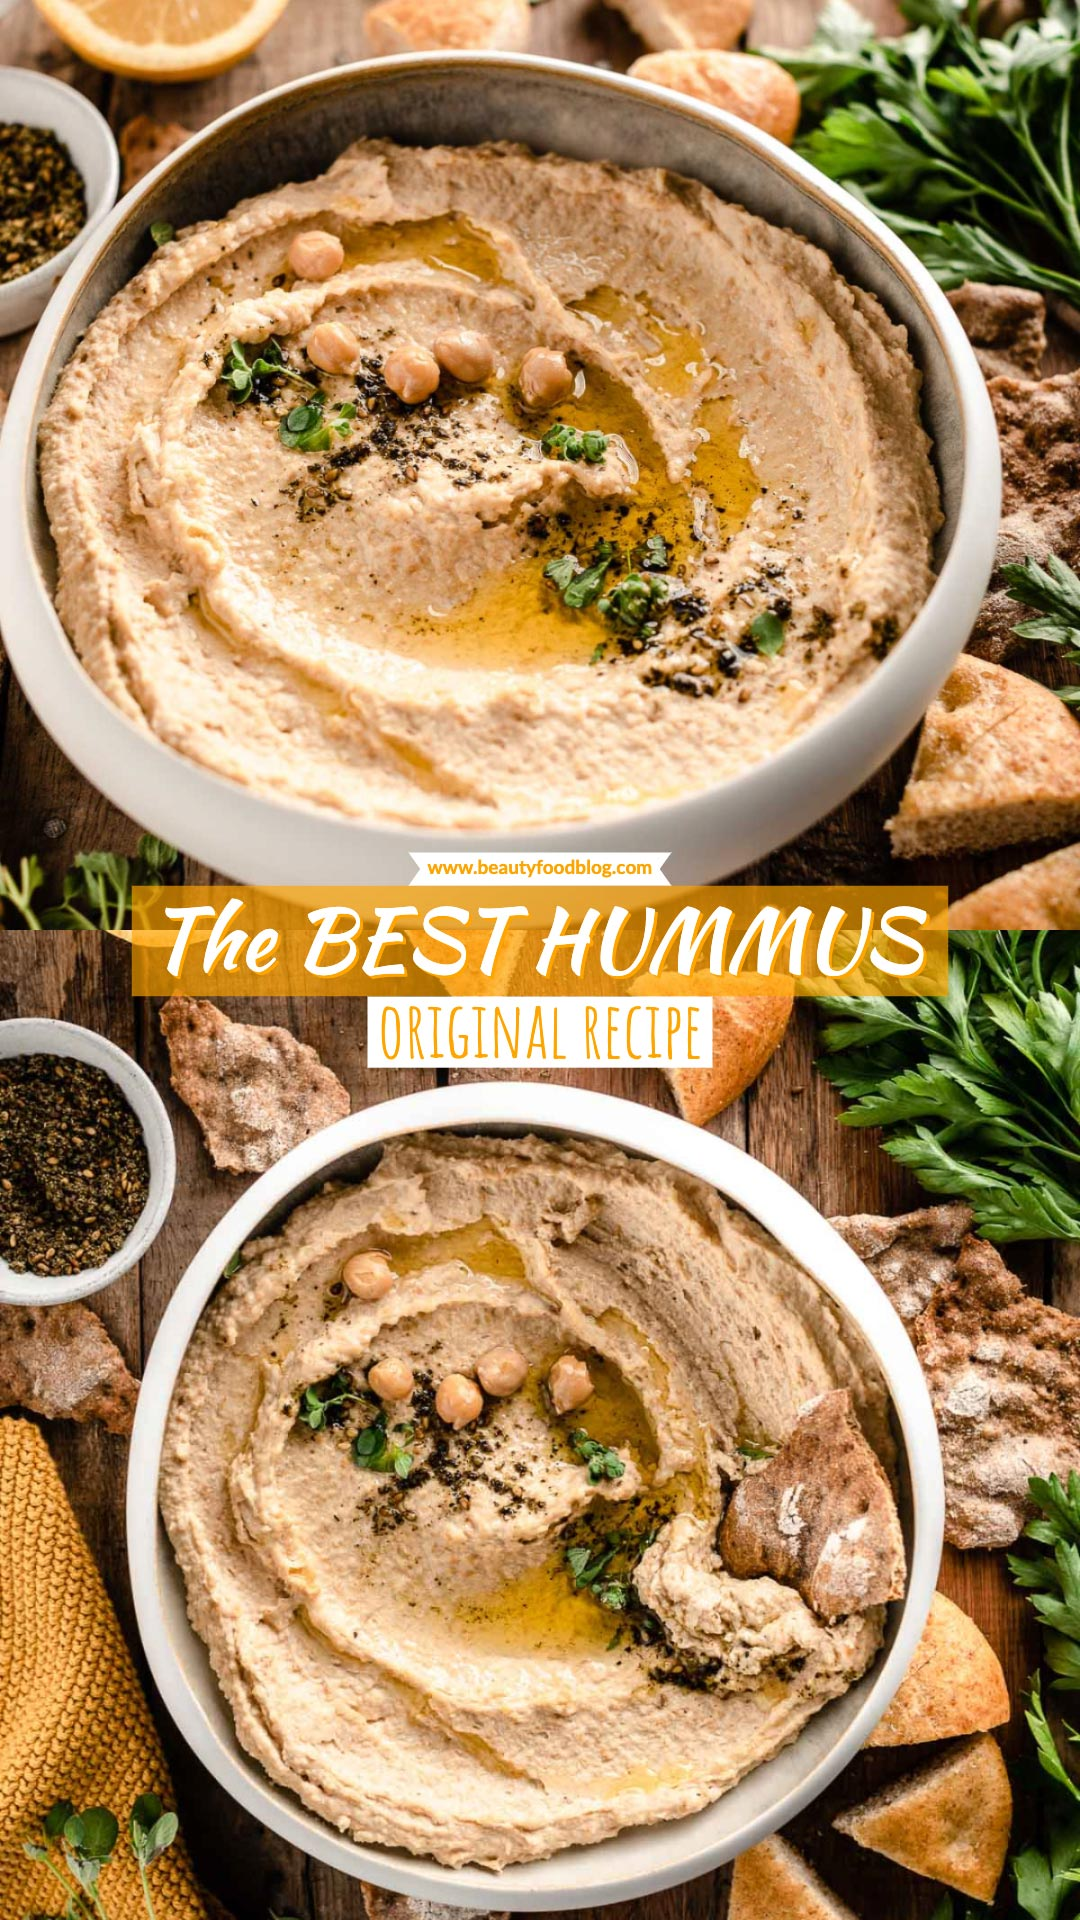 How to make the BEST CREAMY HUMMUS recipe with tahini and za'atar ricetta HUMMUS di CECI originale CREMOSO con tahina #vegan #hummus #chickpeas